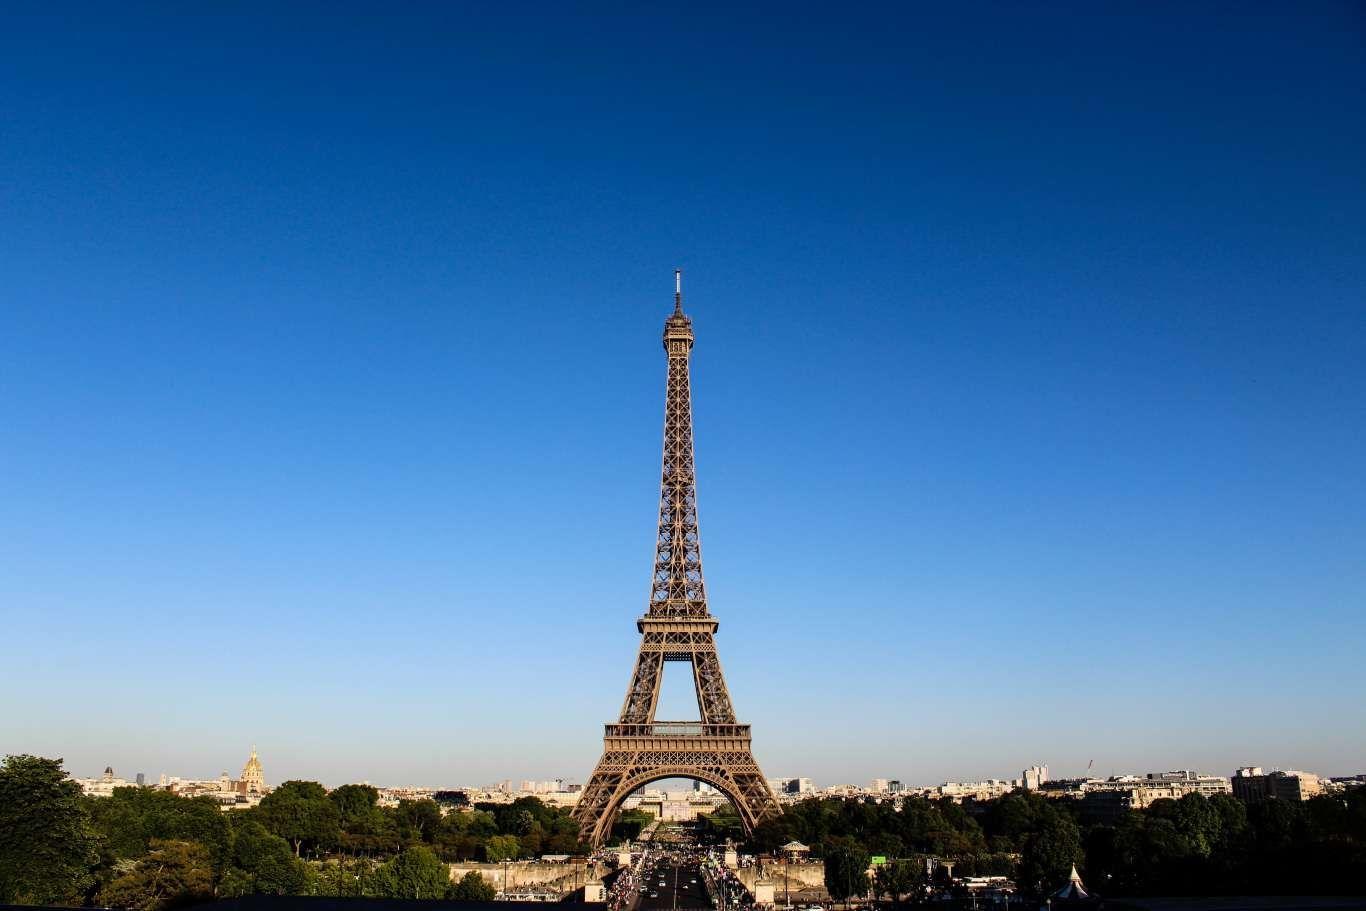 Pelanggaran! Mengunggah Gambar Eiffel di Media Sosial Menyalahi Hukum?